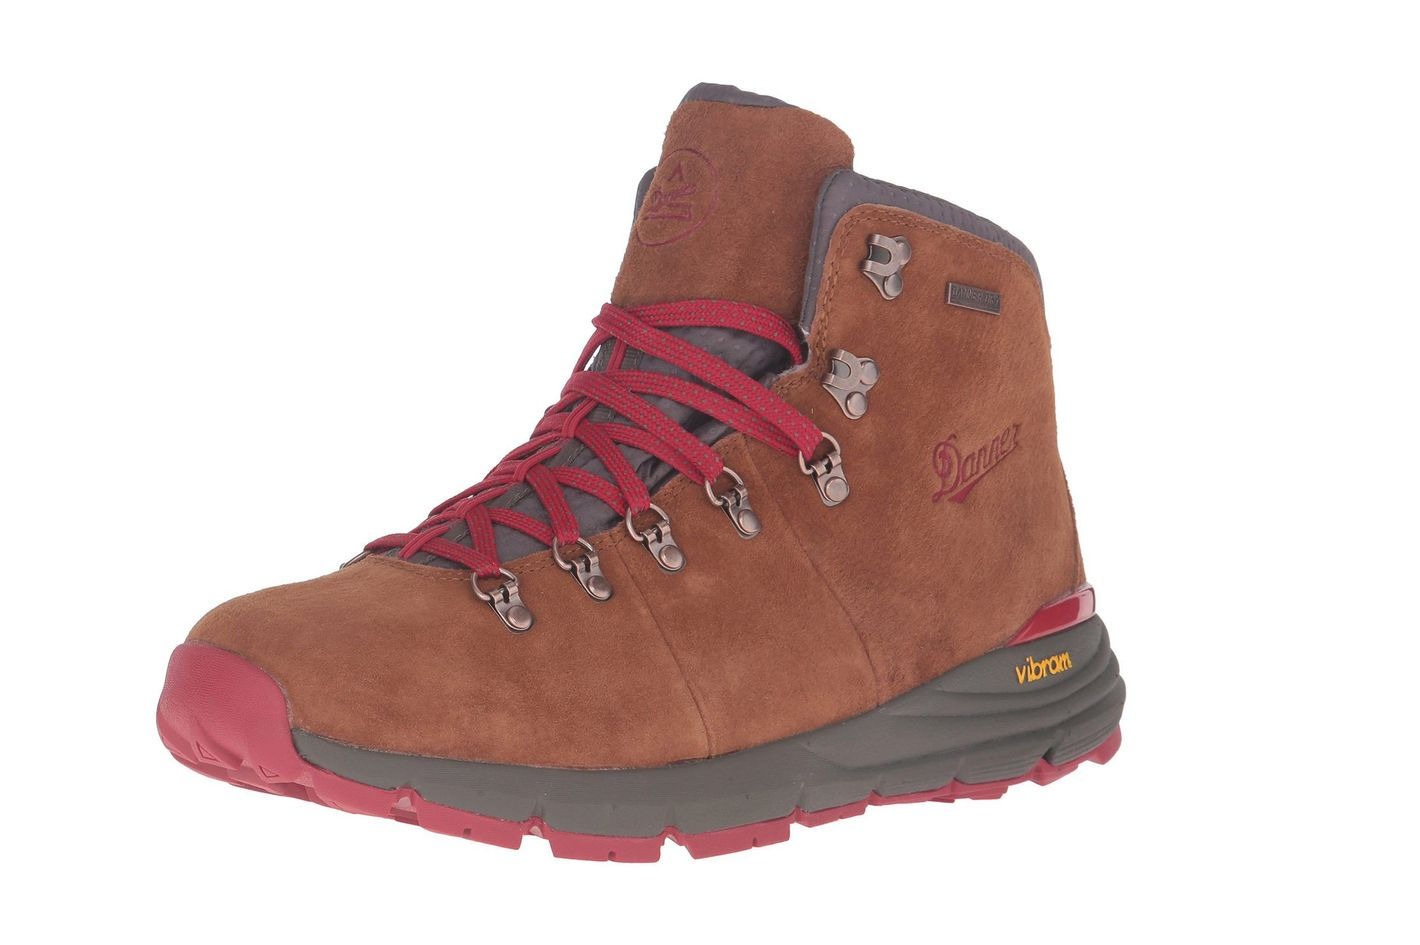 "ce09c793b Danner Men s Mountain 600 4.5"" Hiking Boot"